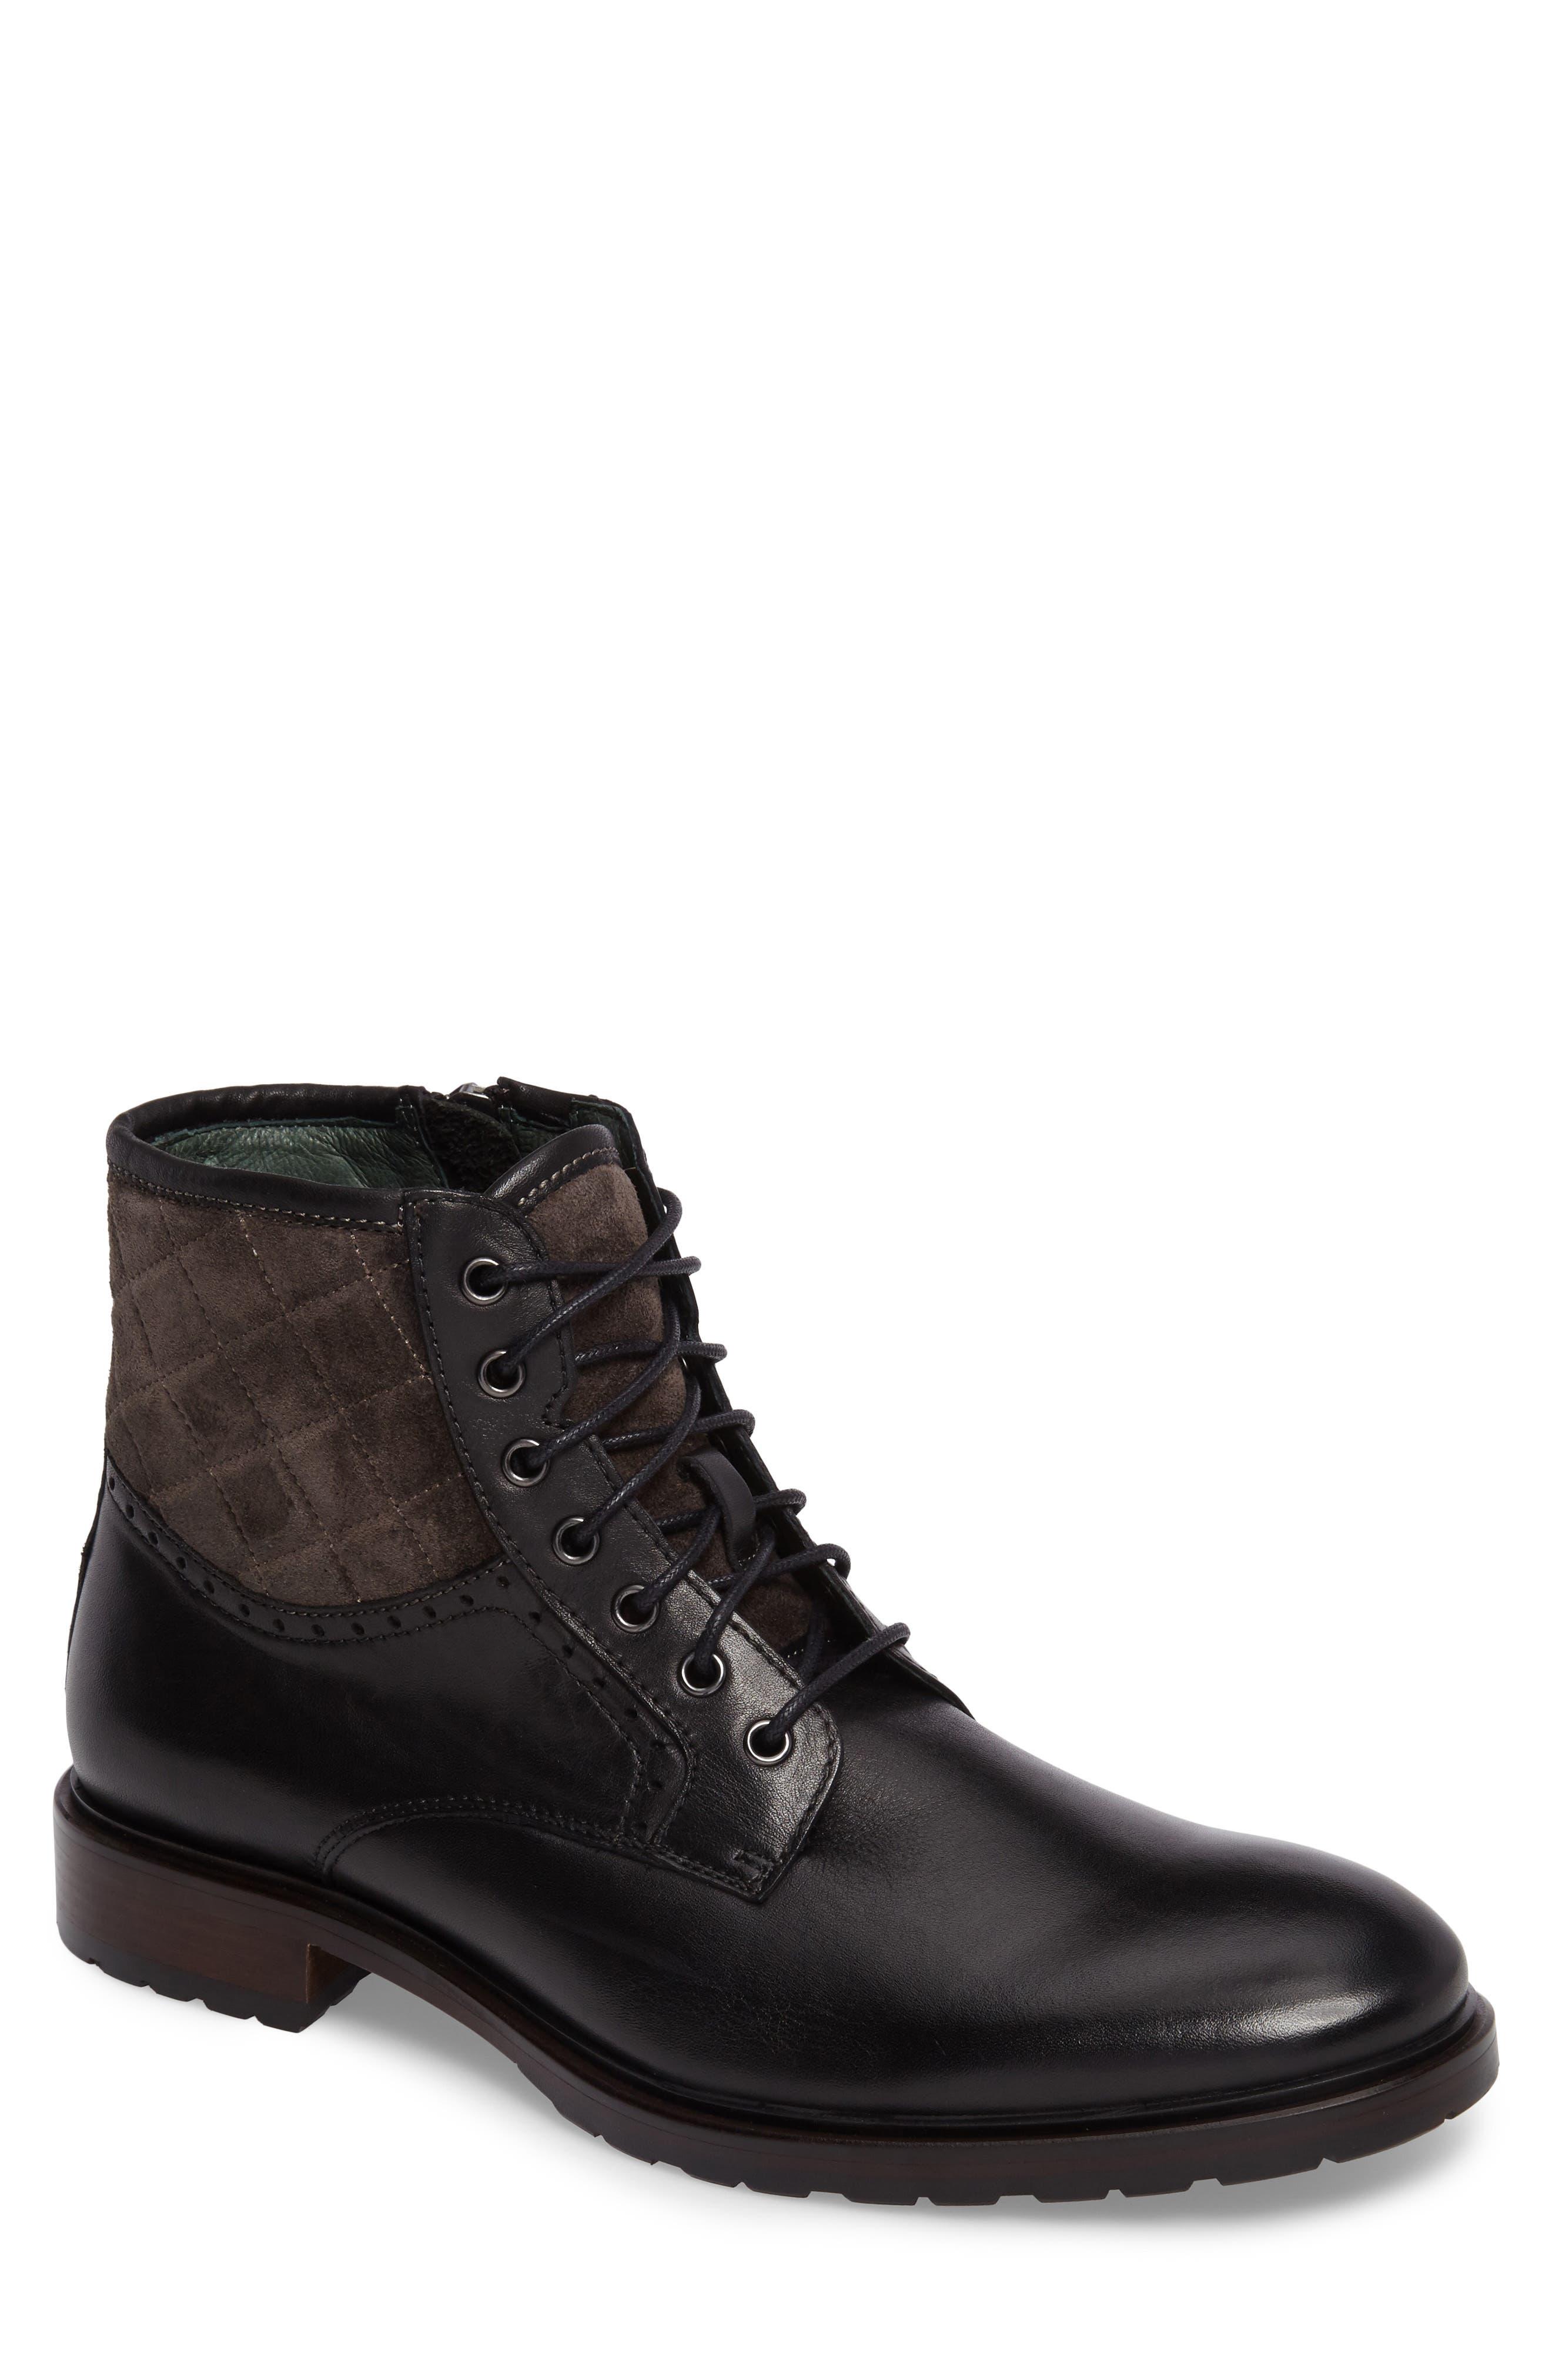 Myles Plain Toe Boot,                             Main thumbnail 1, color,                             Black Leather